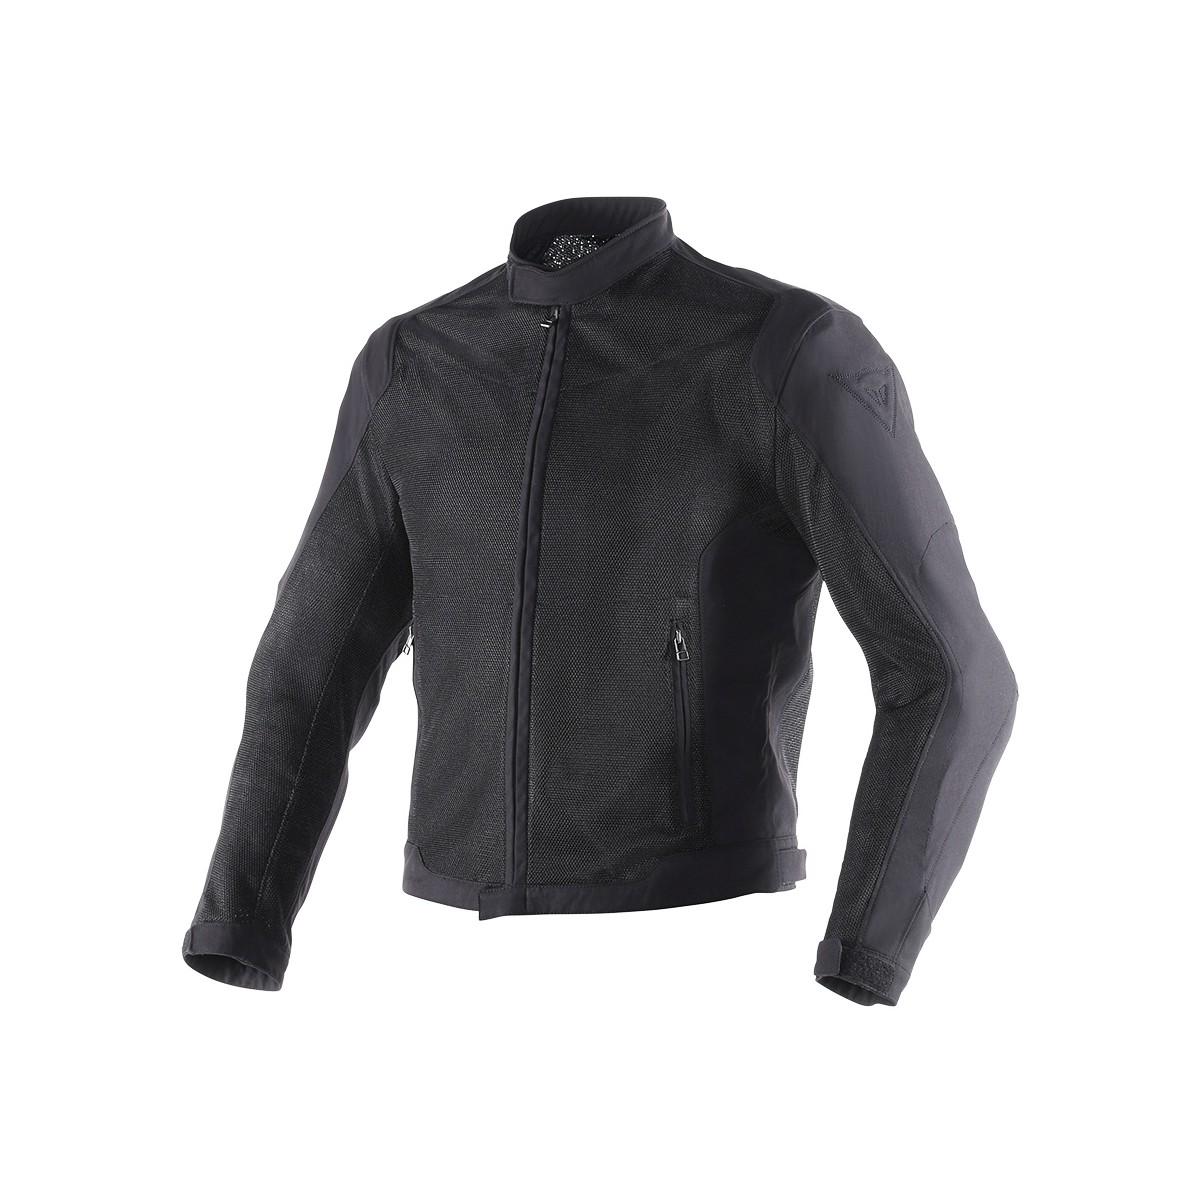 74650167 Chaqueta Dainese Air Flux D1 Tex negro / negro, compra online